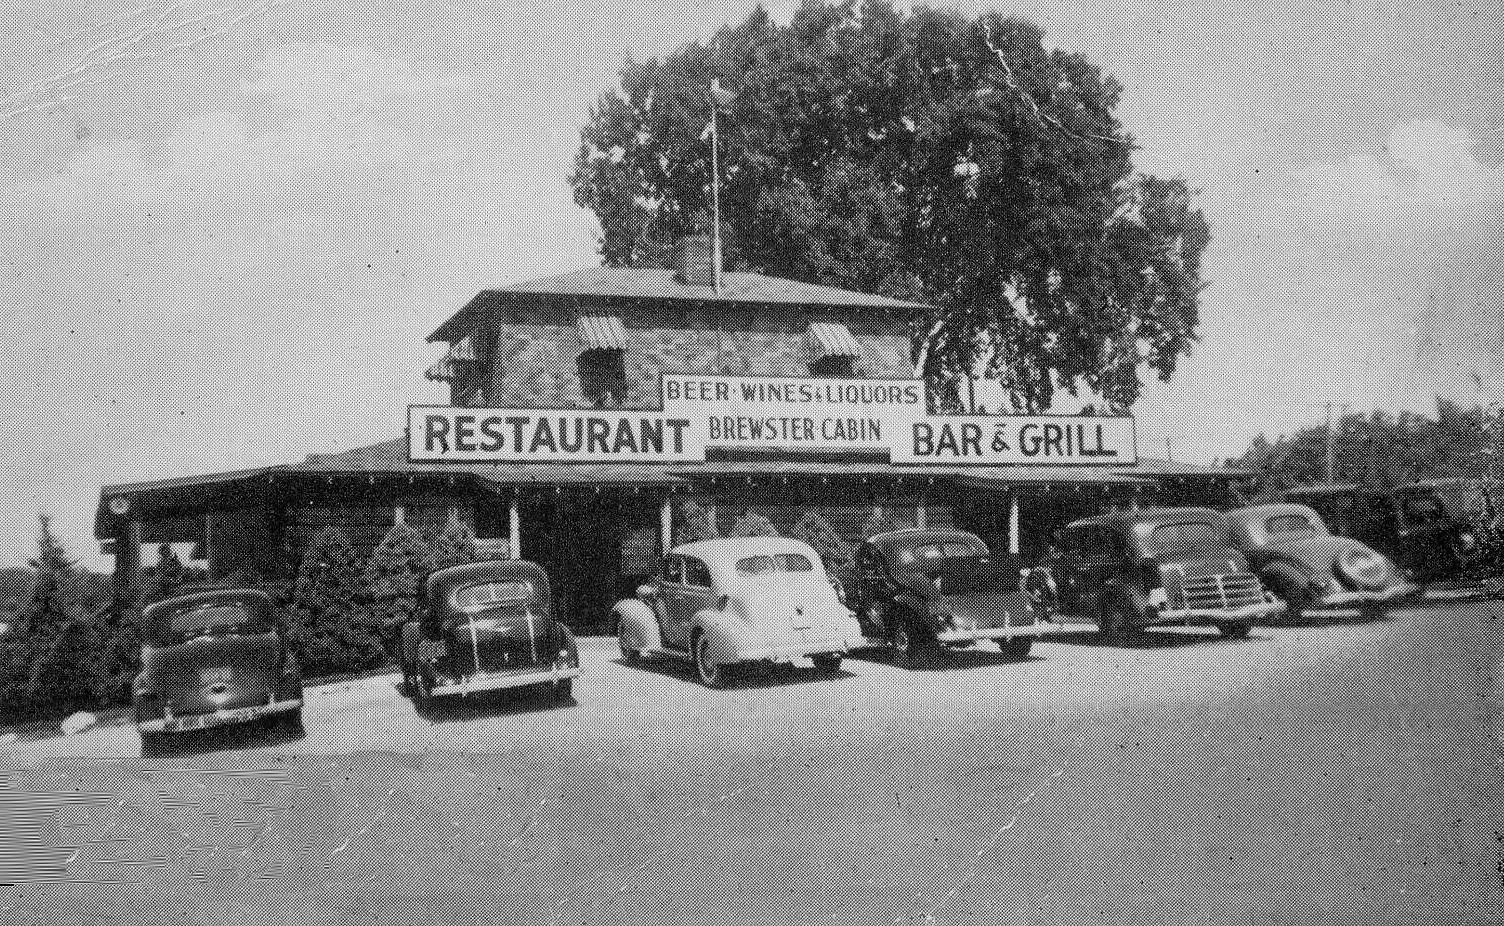 Brewster Cabin Bar & Grill, RT 6 & 22, Brewster NY, Putnam County